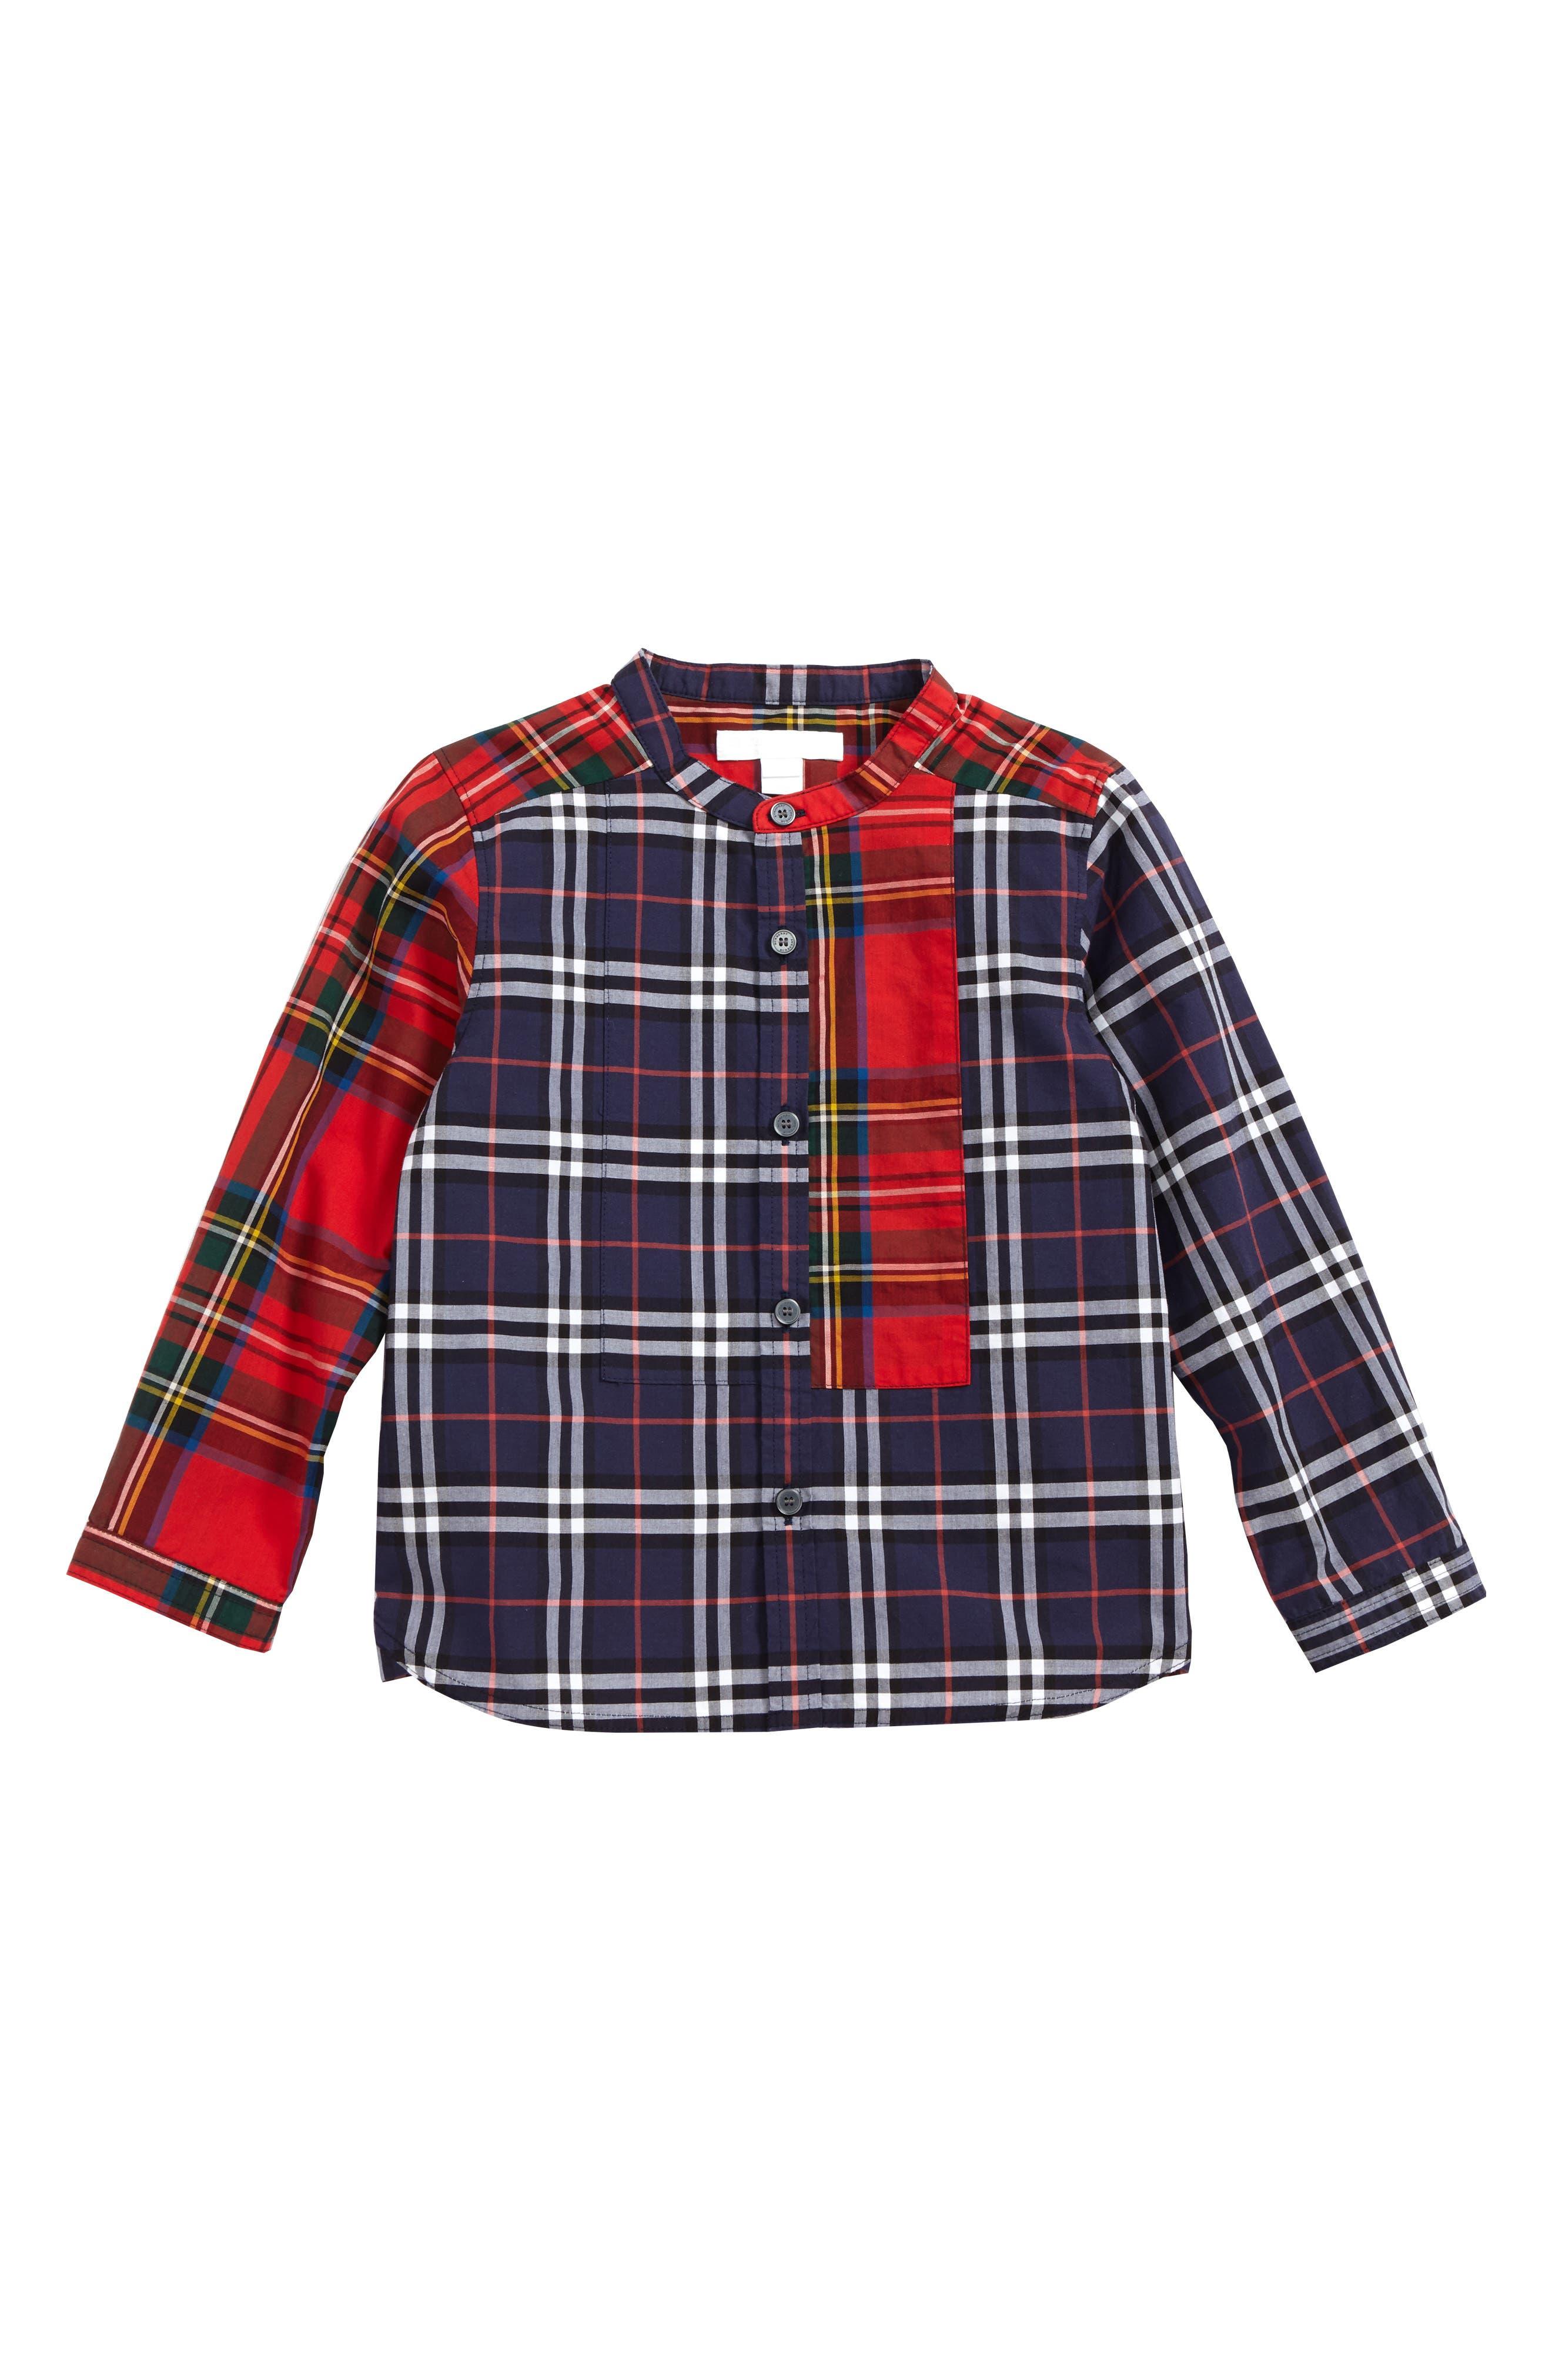 Burberry Argus Check Print Woven Shirt (Toddler Boys)